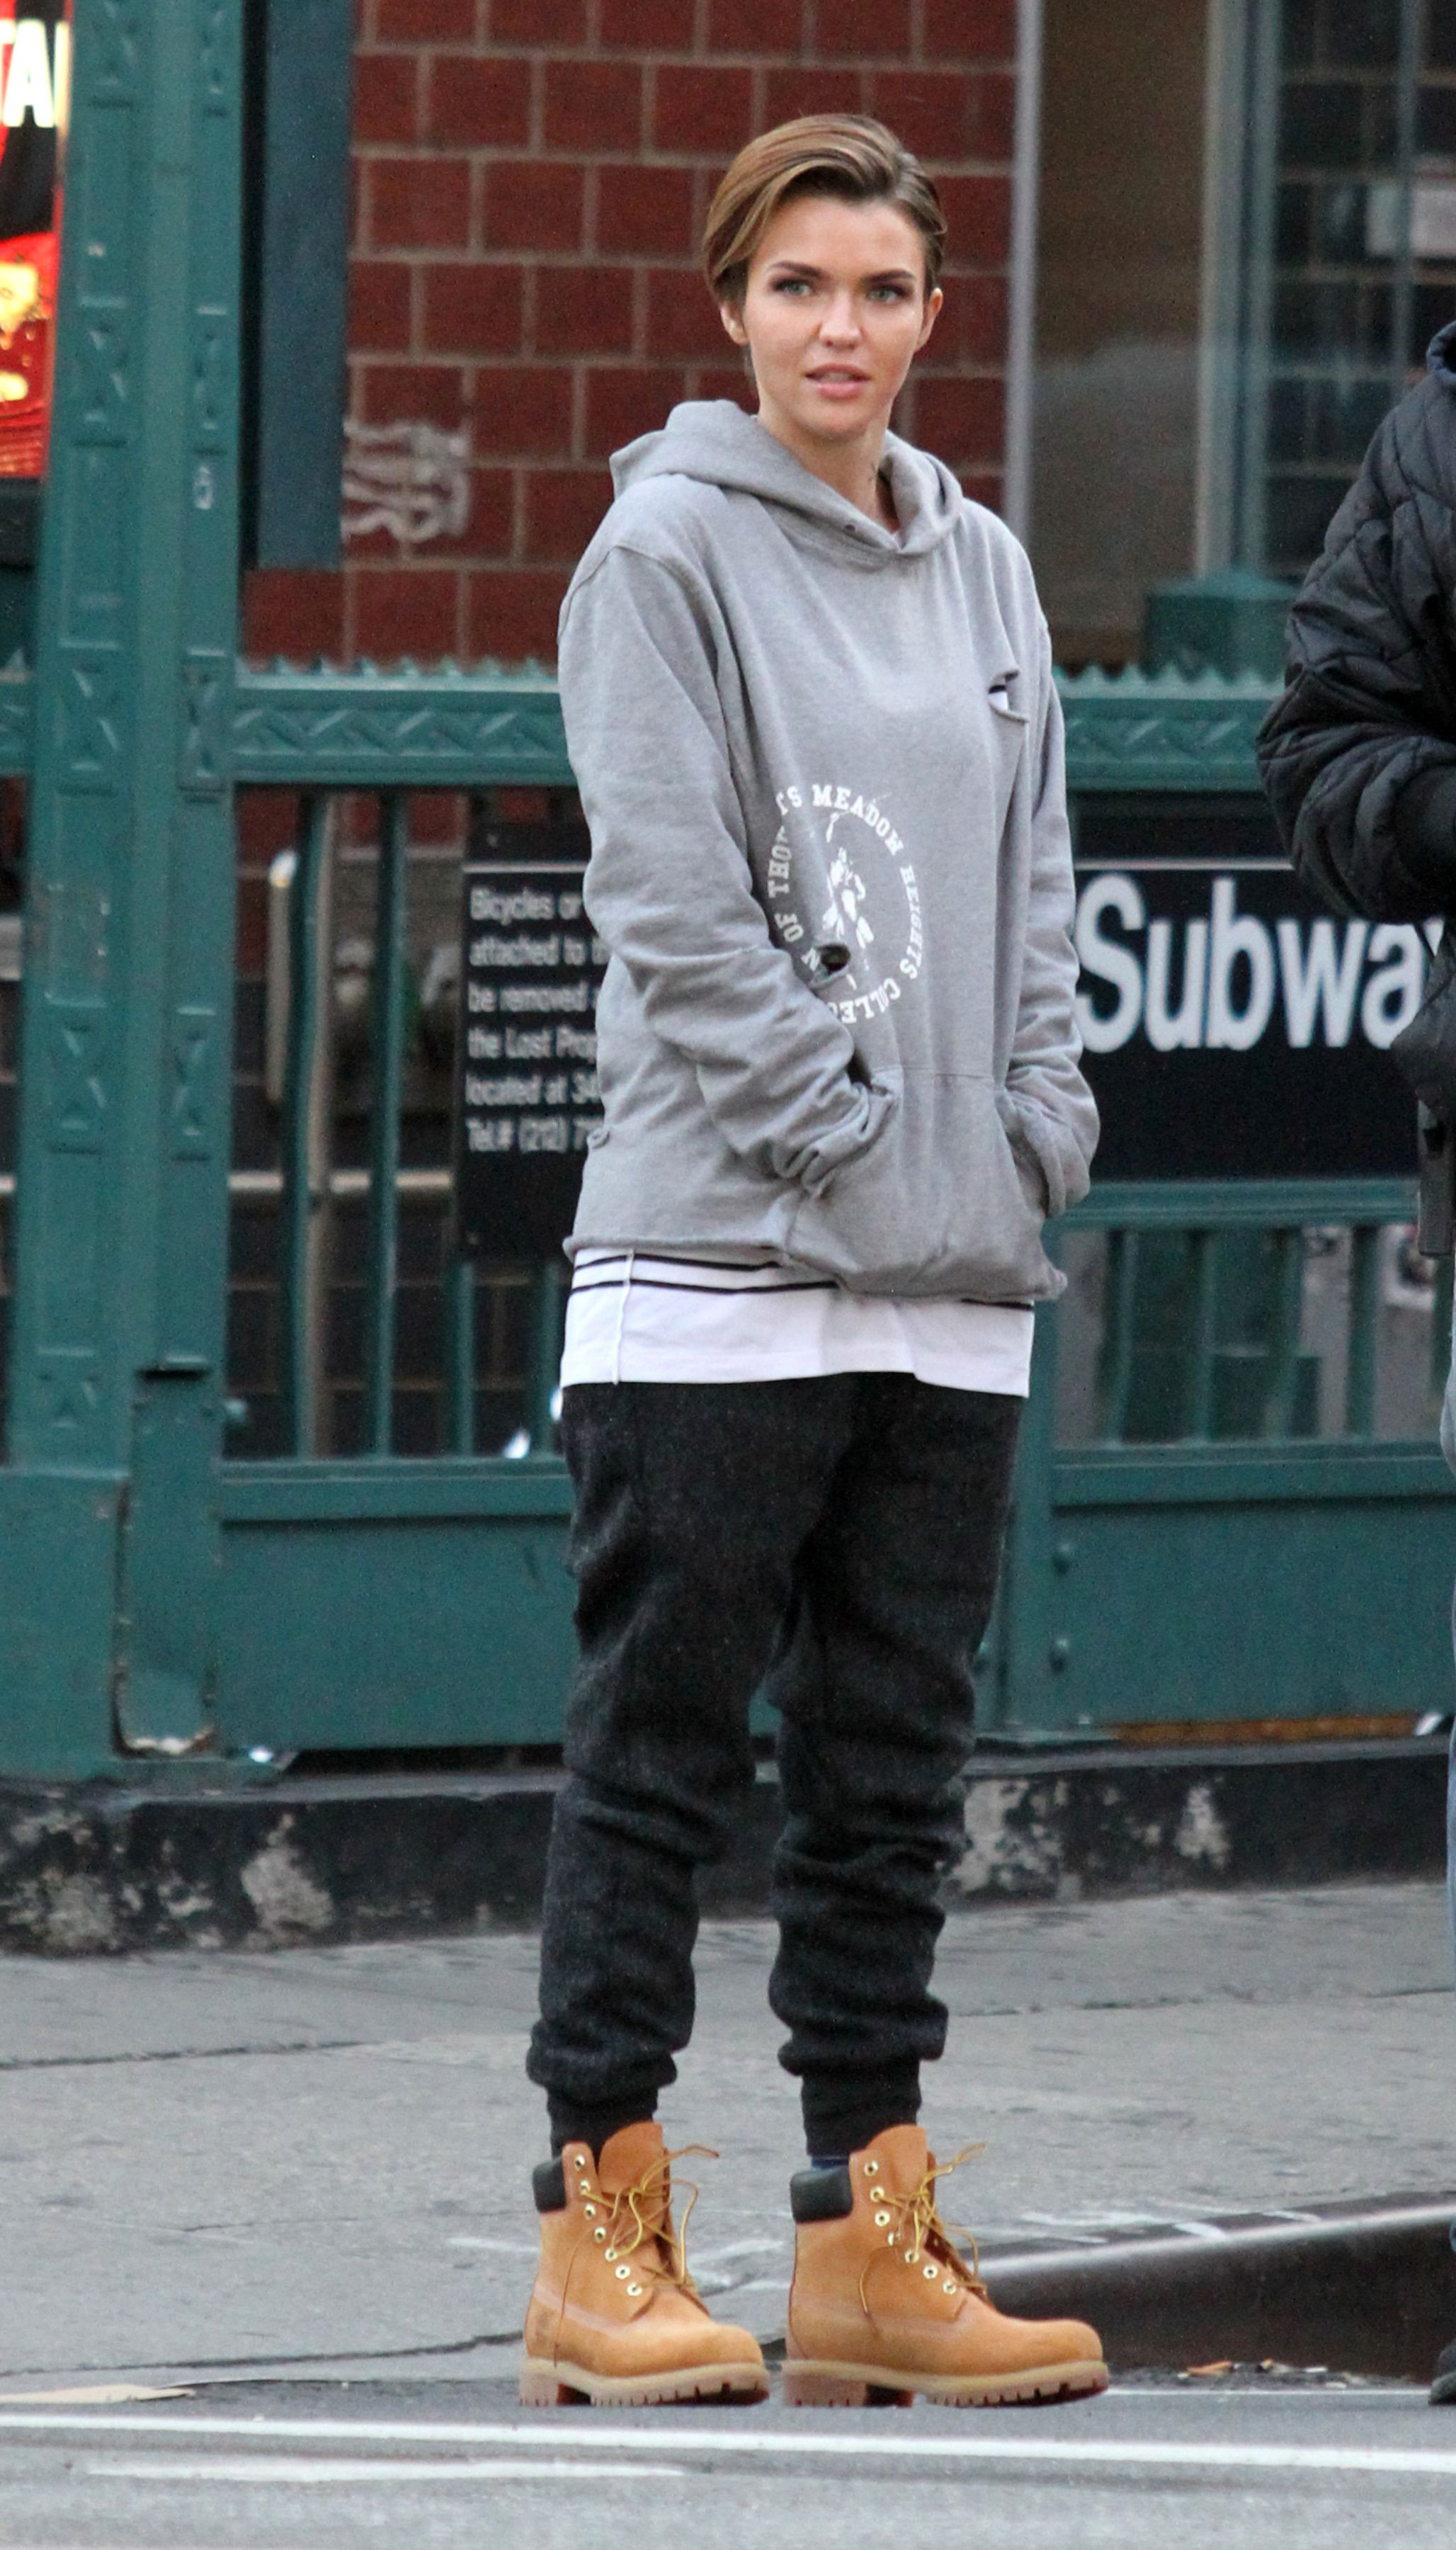 Limitededition springsummer casualwear streetwear genderfluid piccogrande streetfashion tomboy outfits